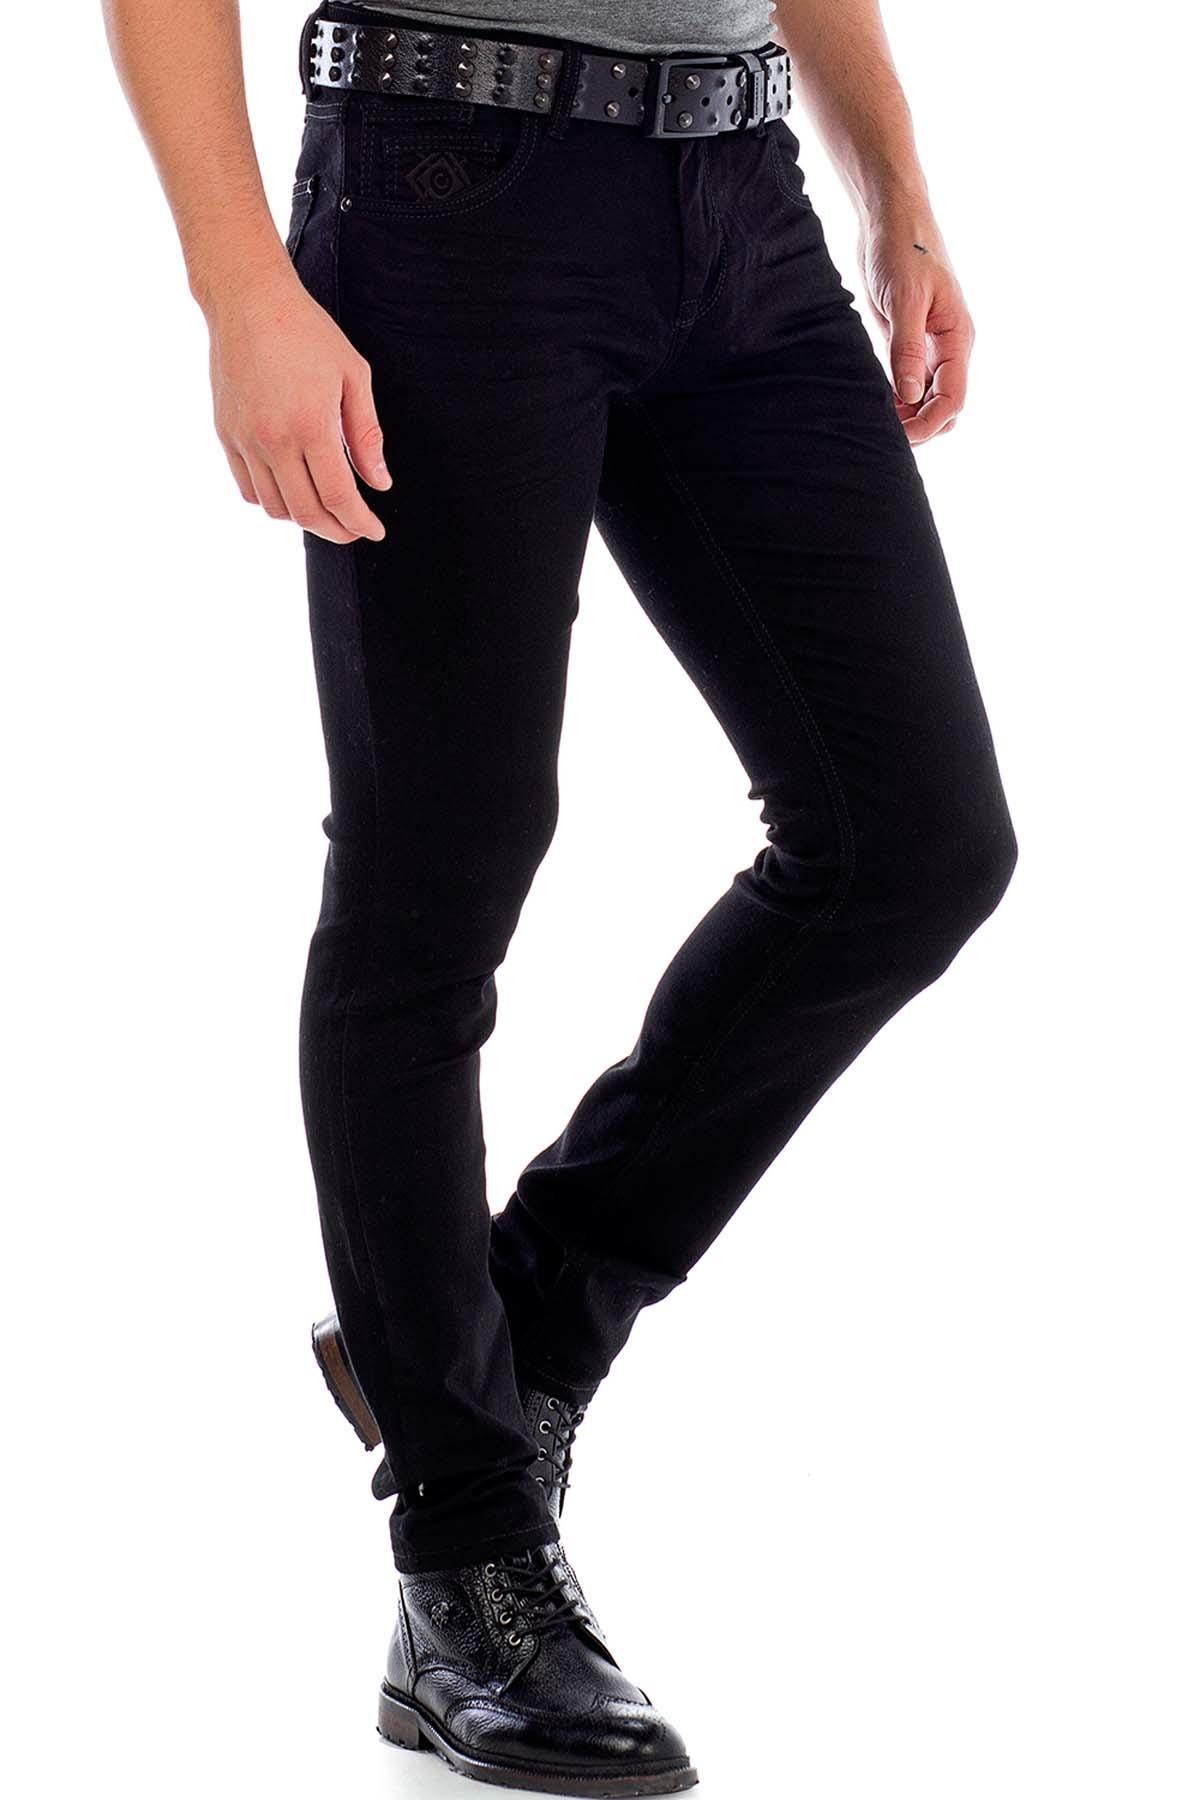 Cipo & Baxx - CD319A Siyah Slim Fit Rahat Erkek Jean Kot Pantolon